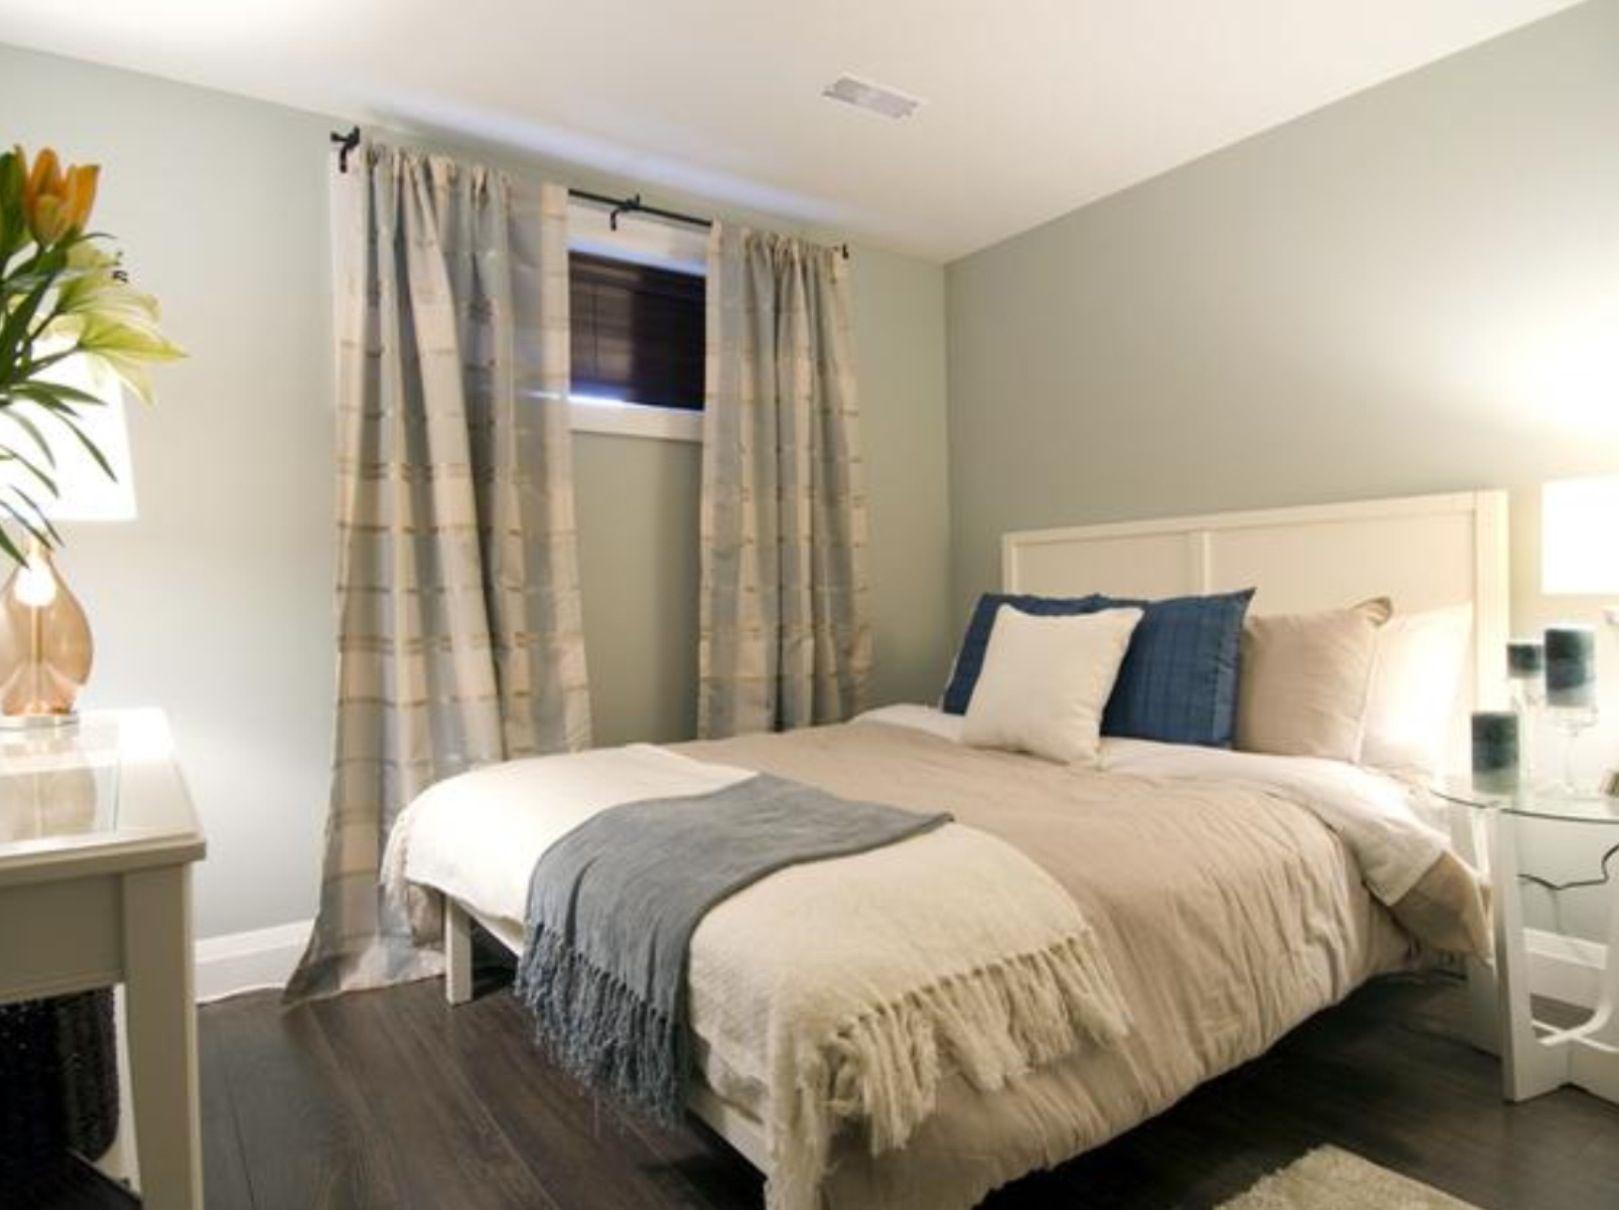 The 7 Best Light Paint Colours For A Dark Room Basement Basement Guest Rooms Remodel Bedroom Basement Bedrooms